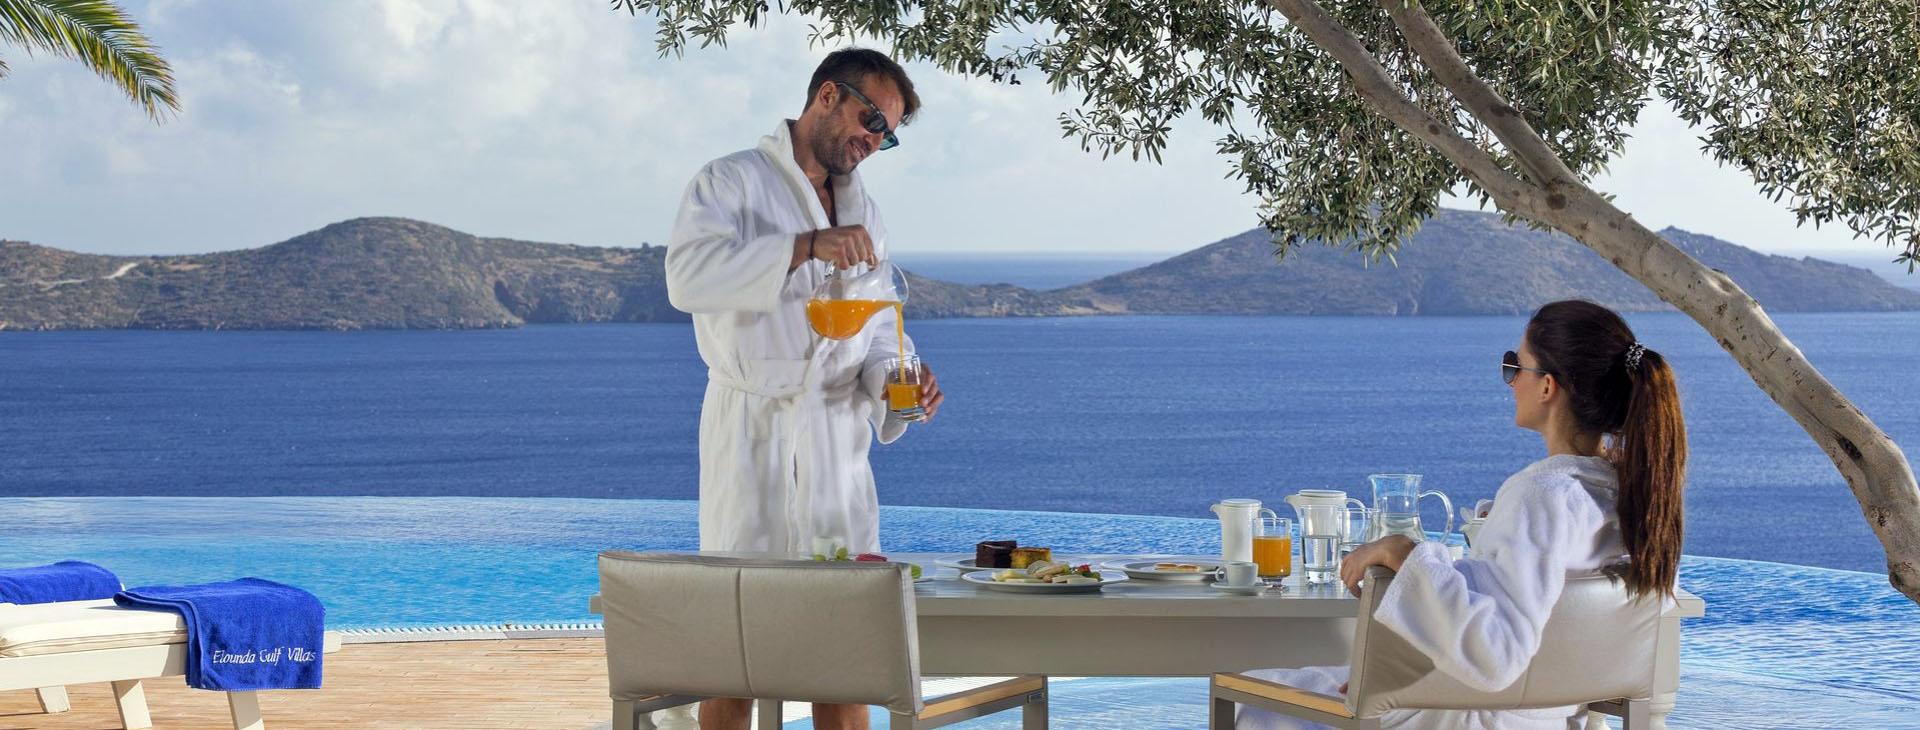 Weddings & Honeymoons in Greece & Greek Islands